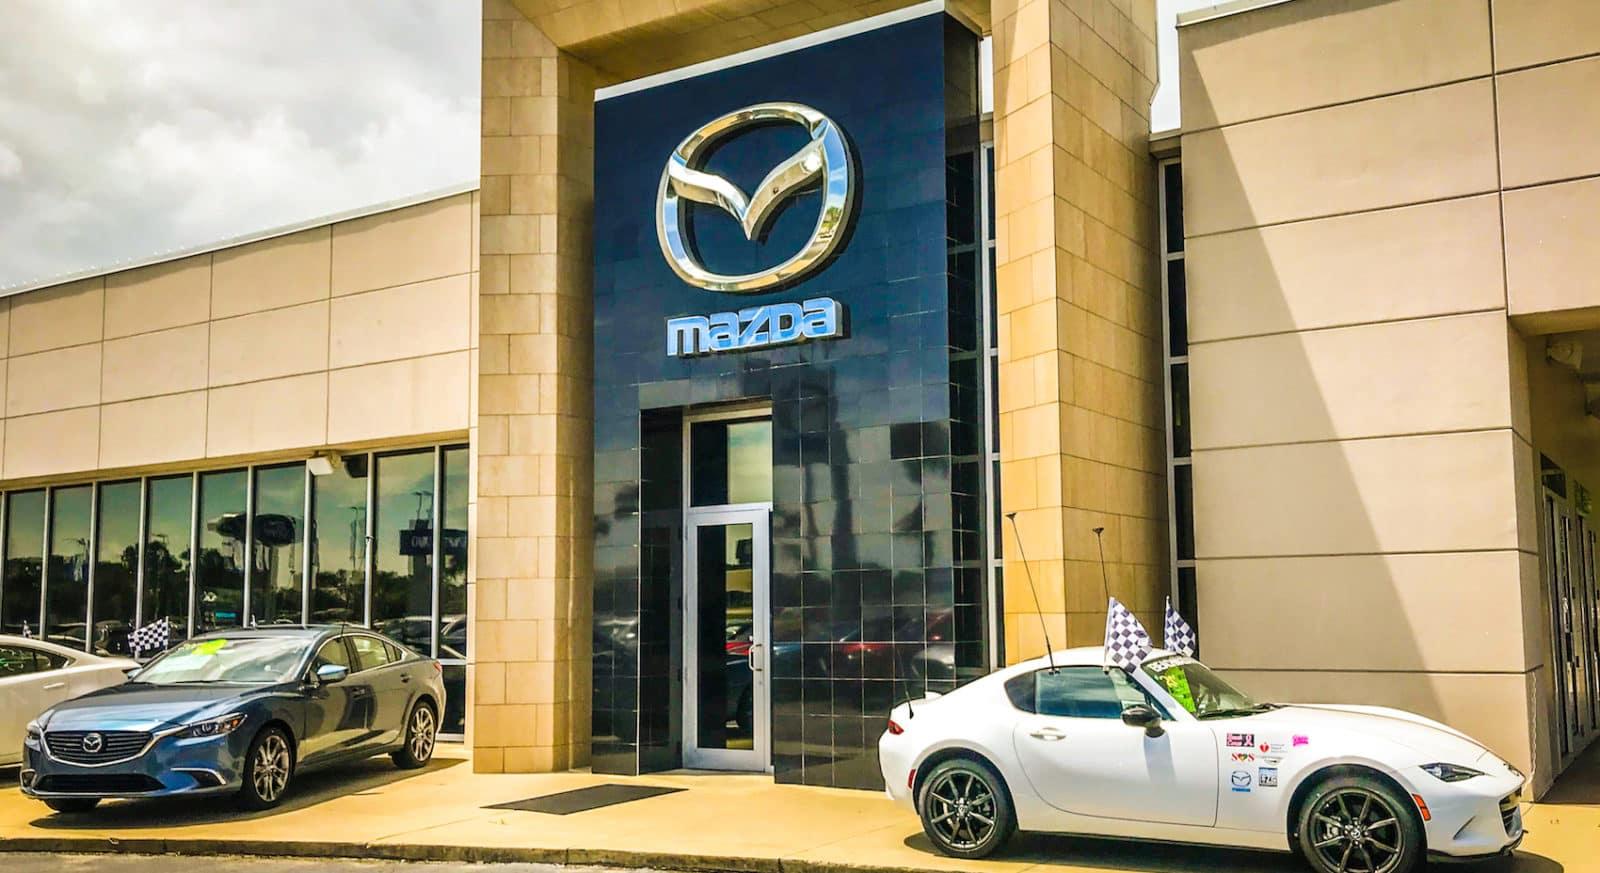 Mazda Homepage Background Image